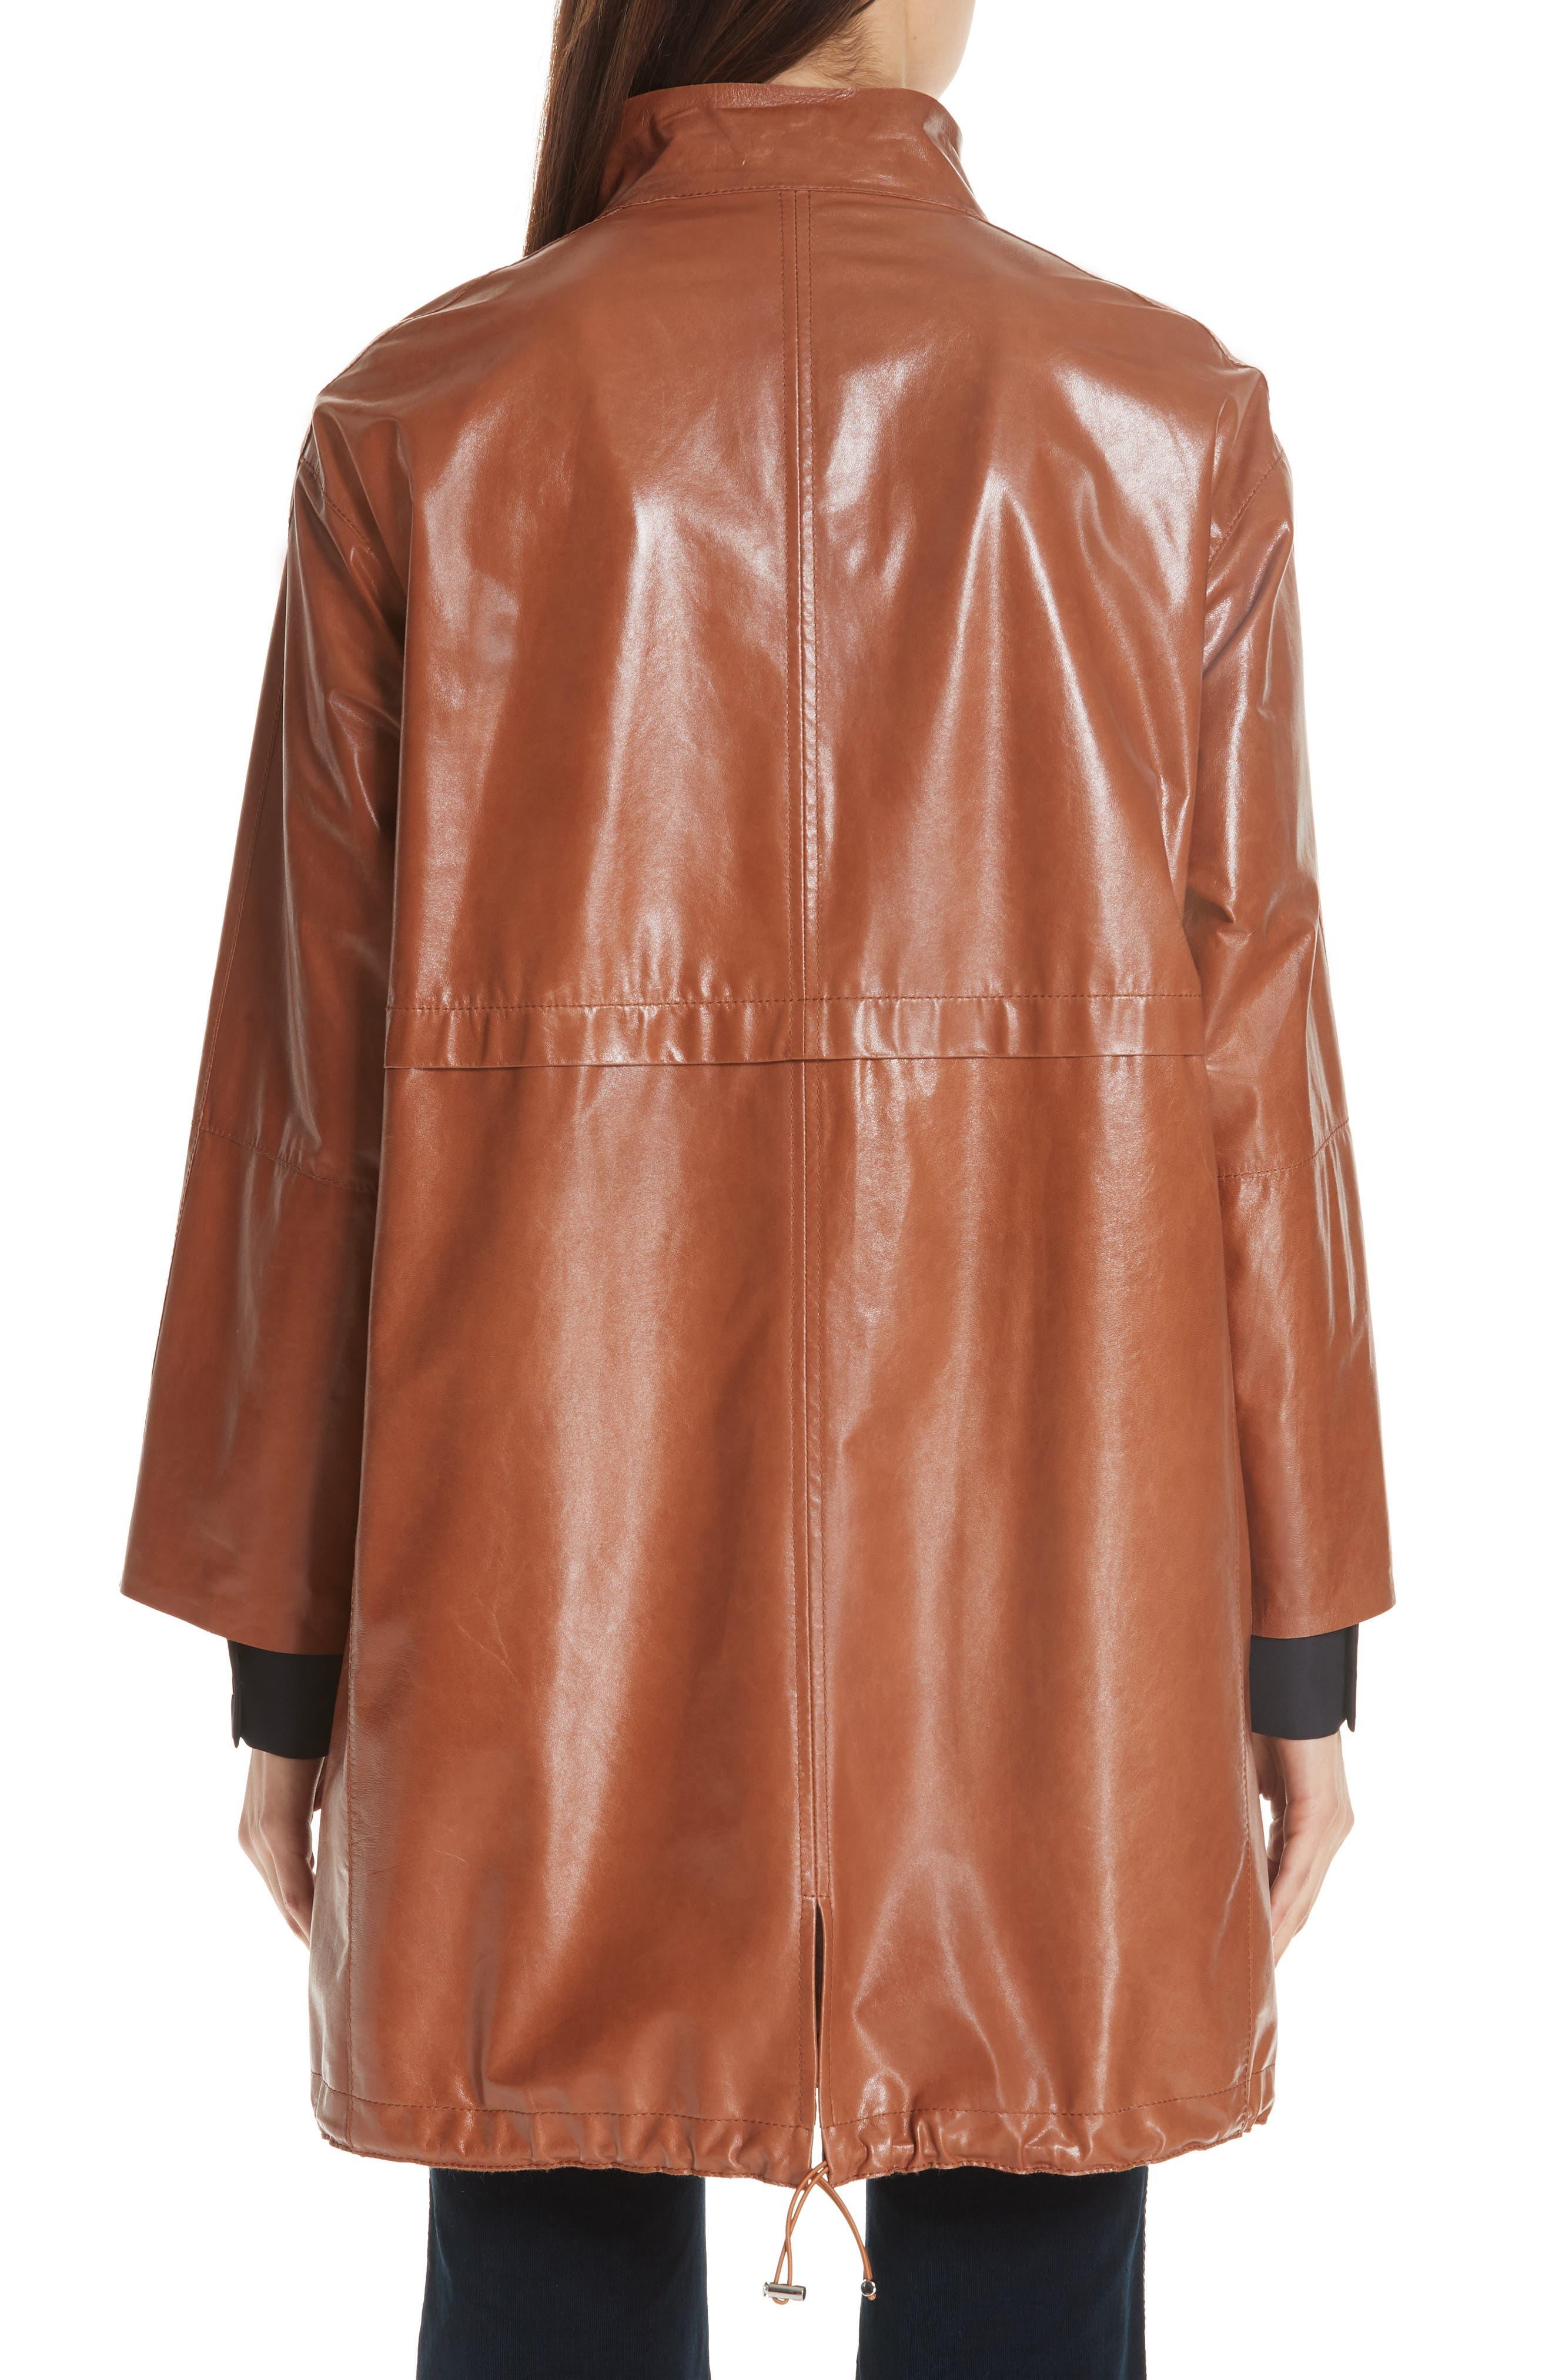 Minerva Leather Jacket,                             Alternate thumbnail 2, color,                             OCHRE